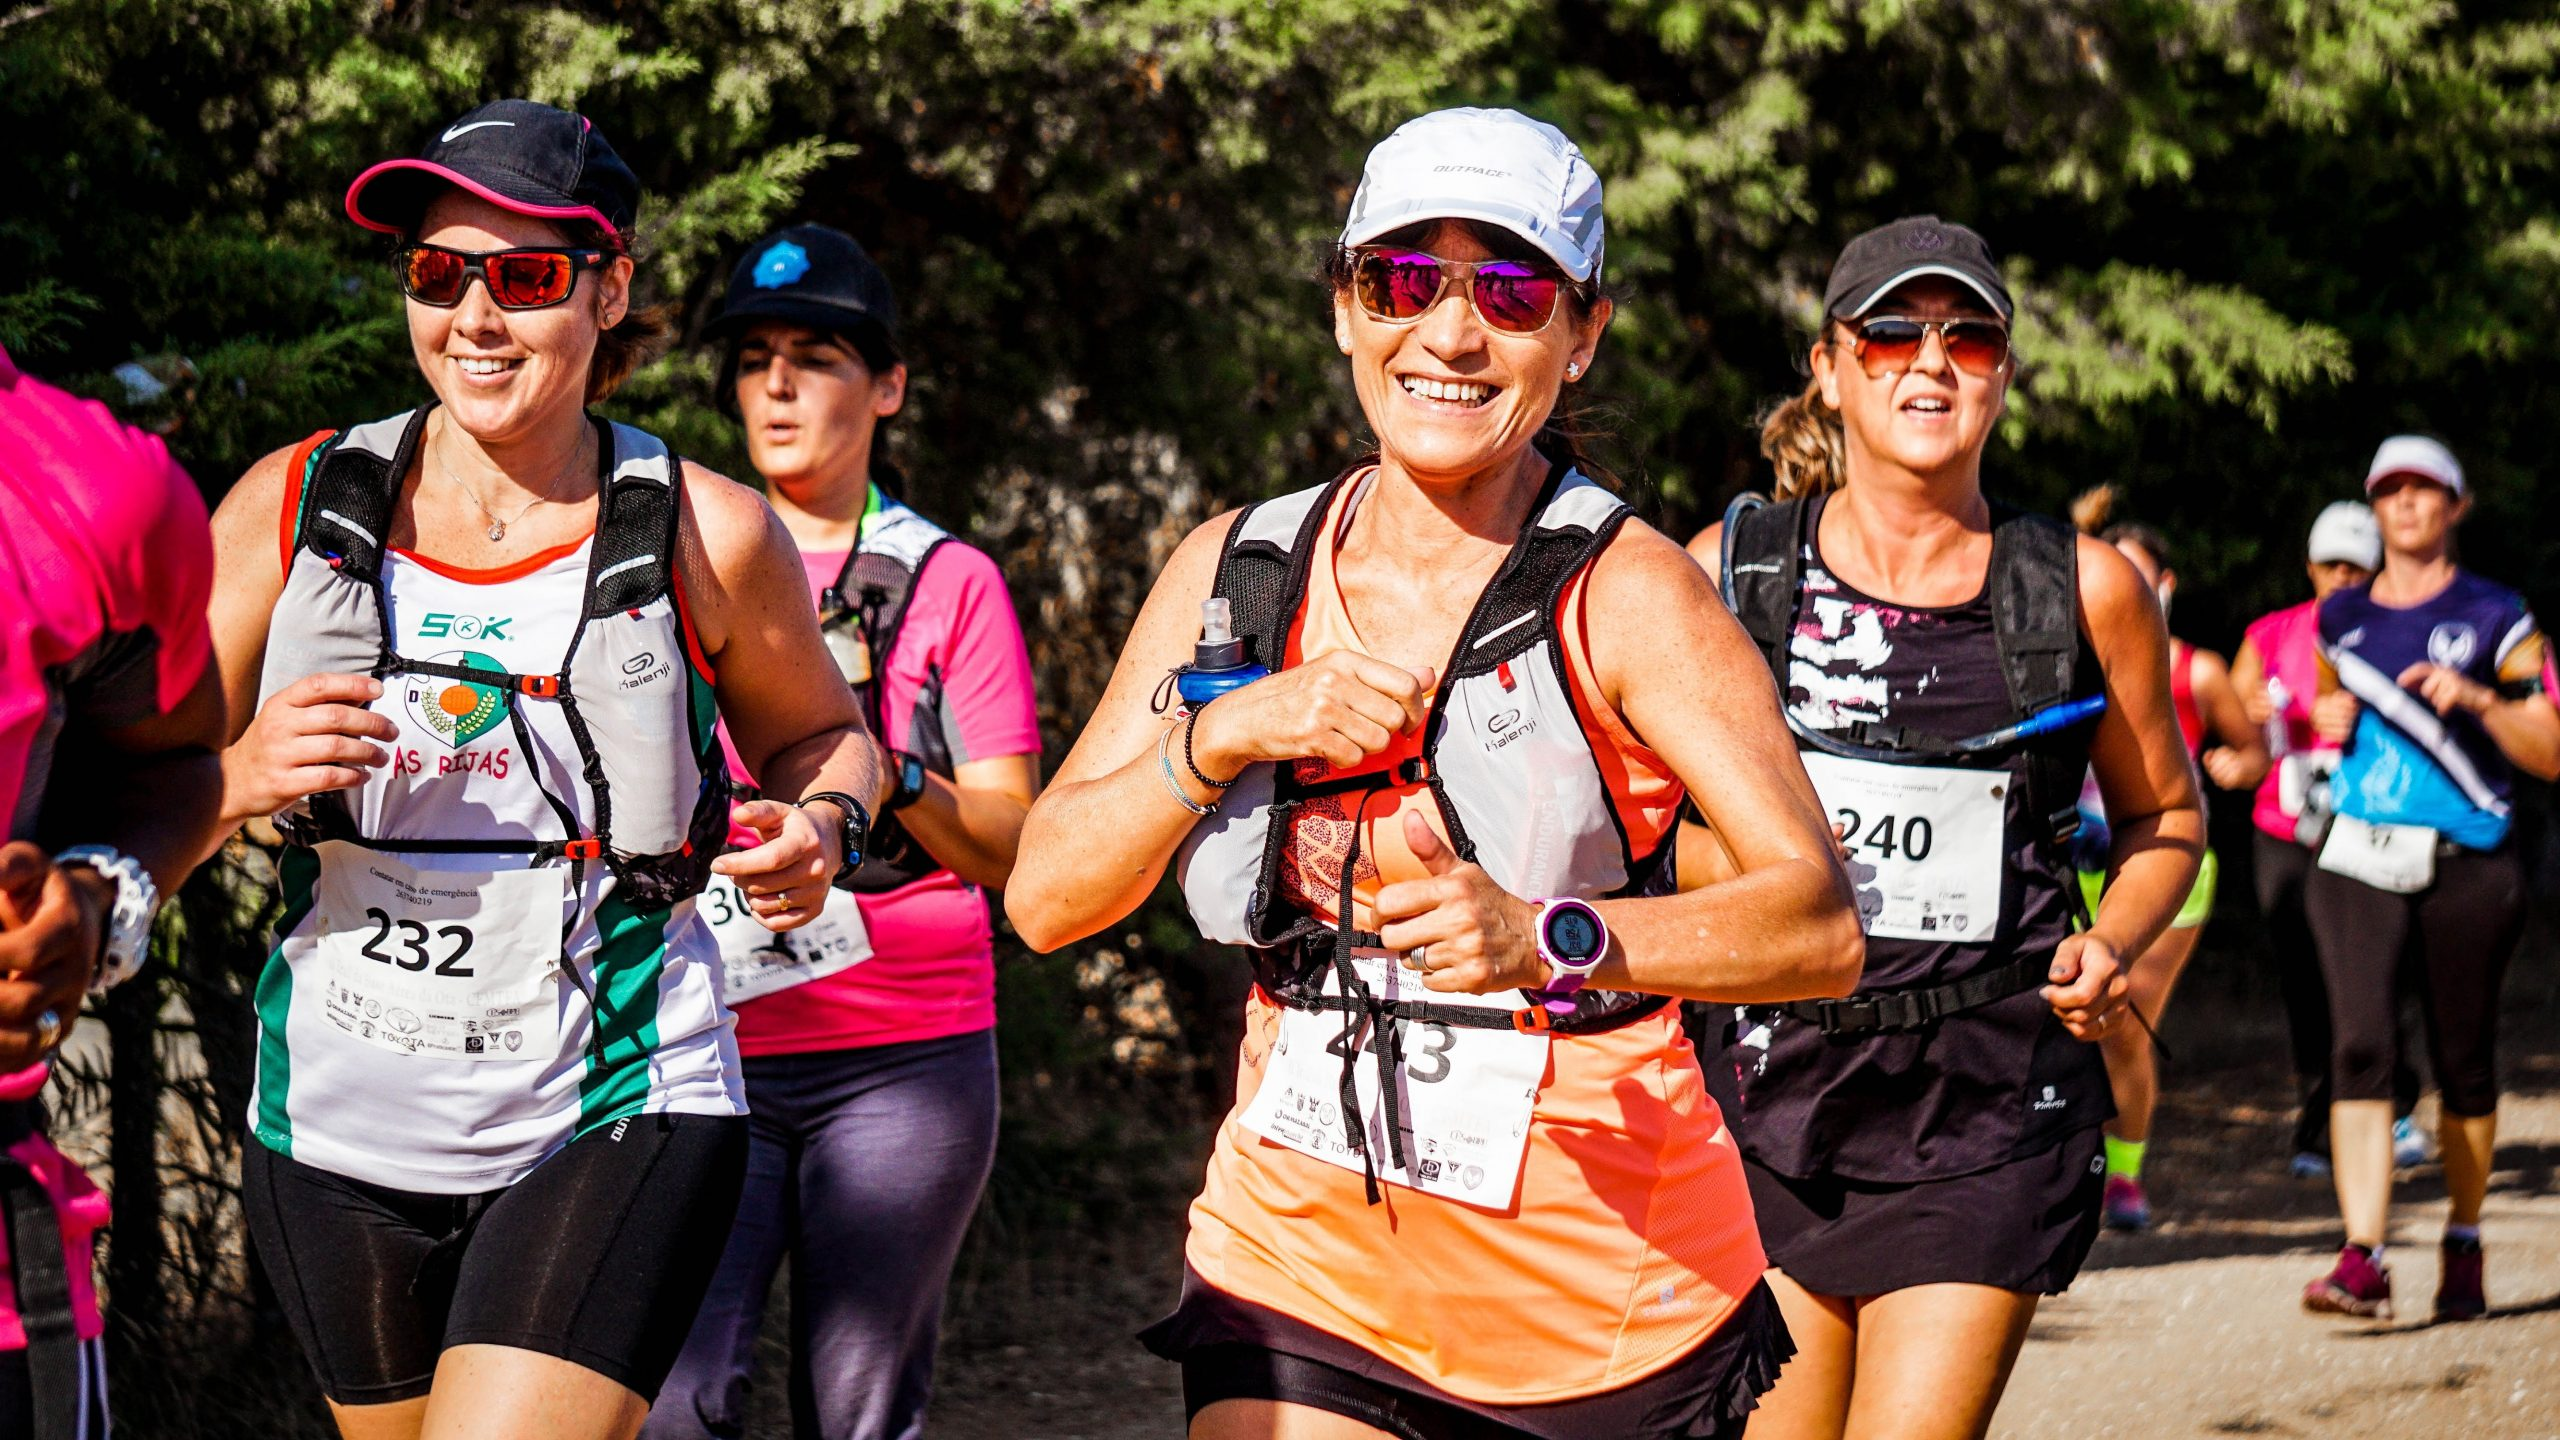 Ladies running Team Names